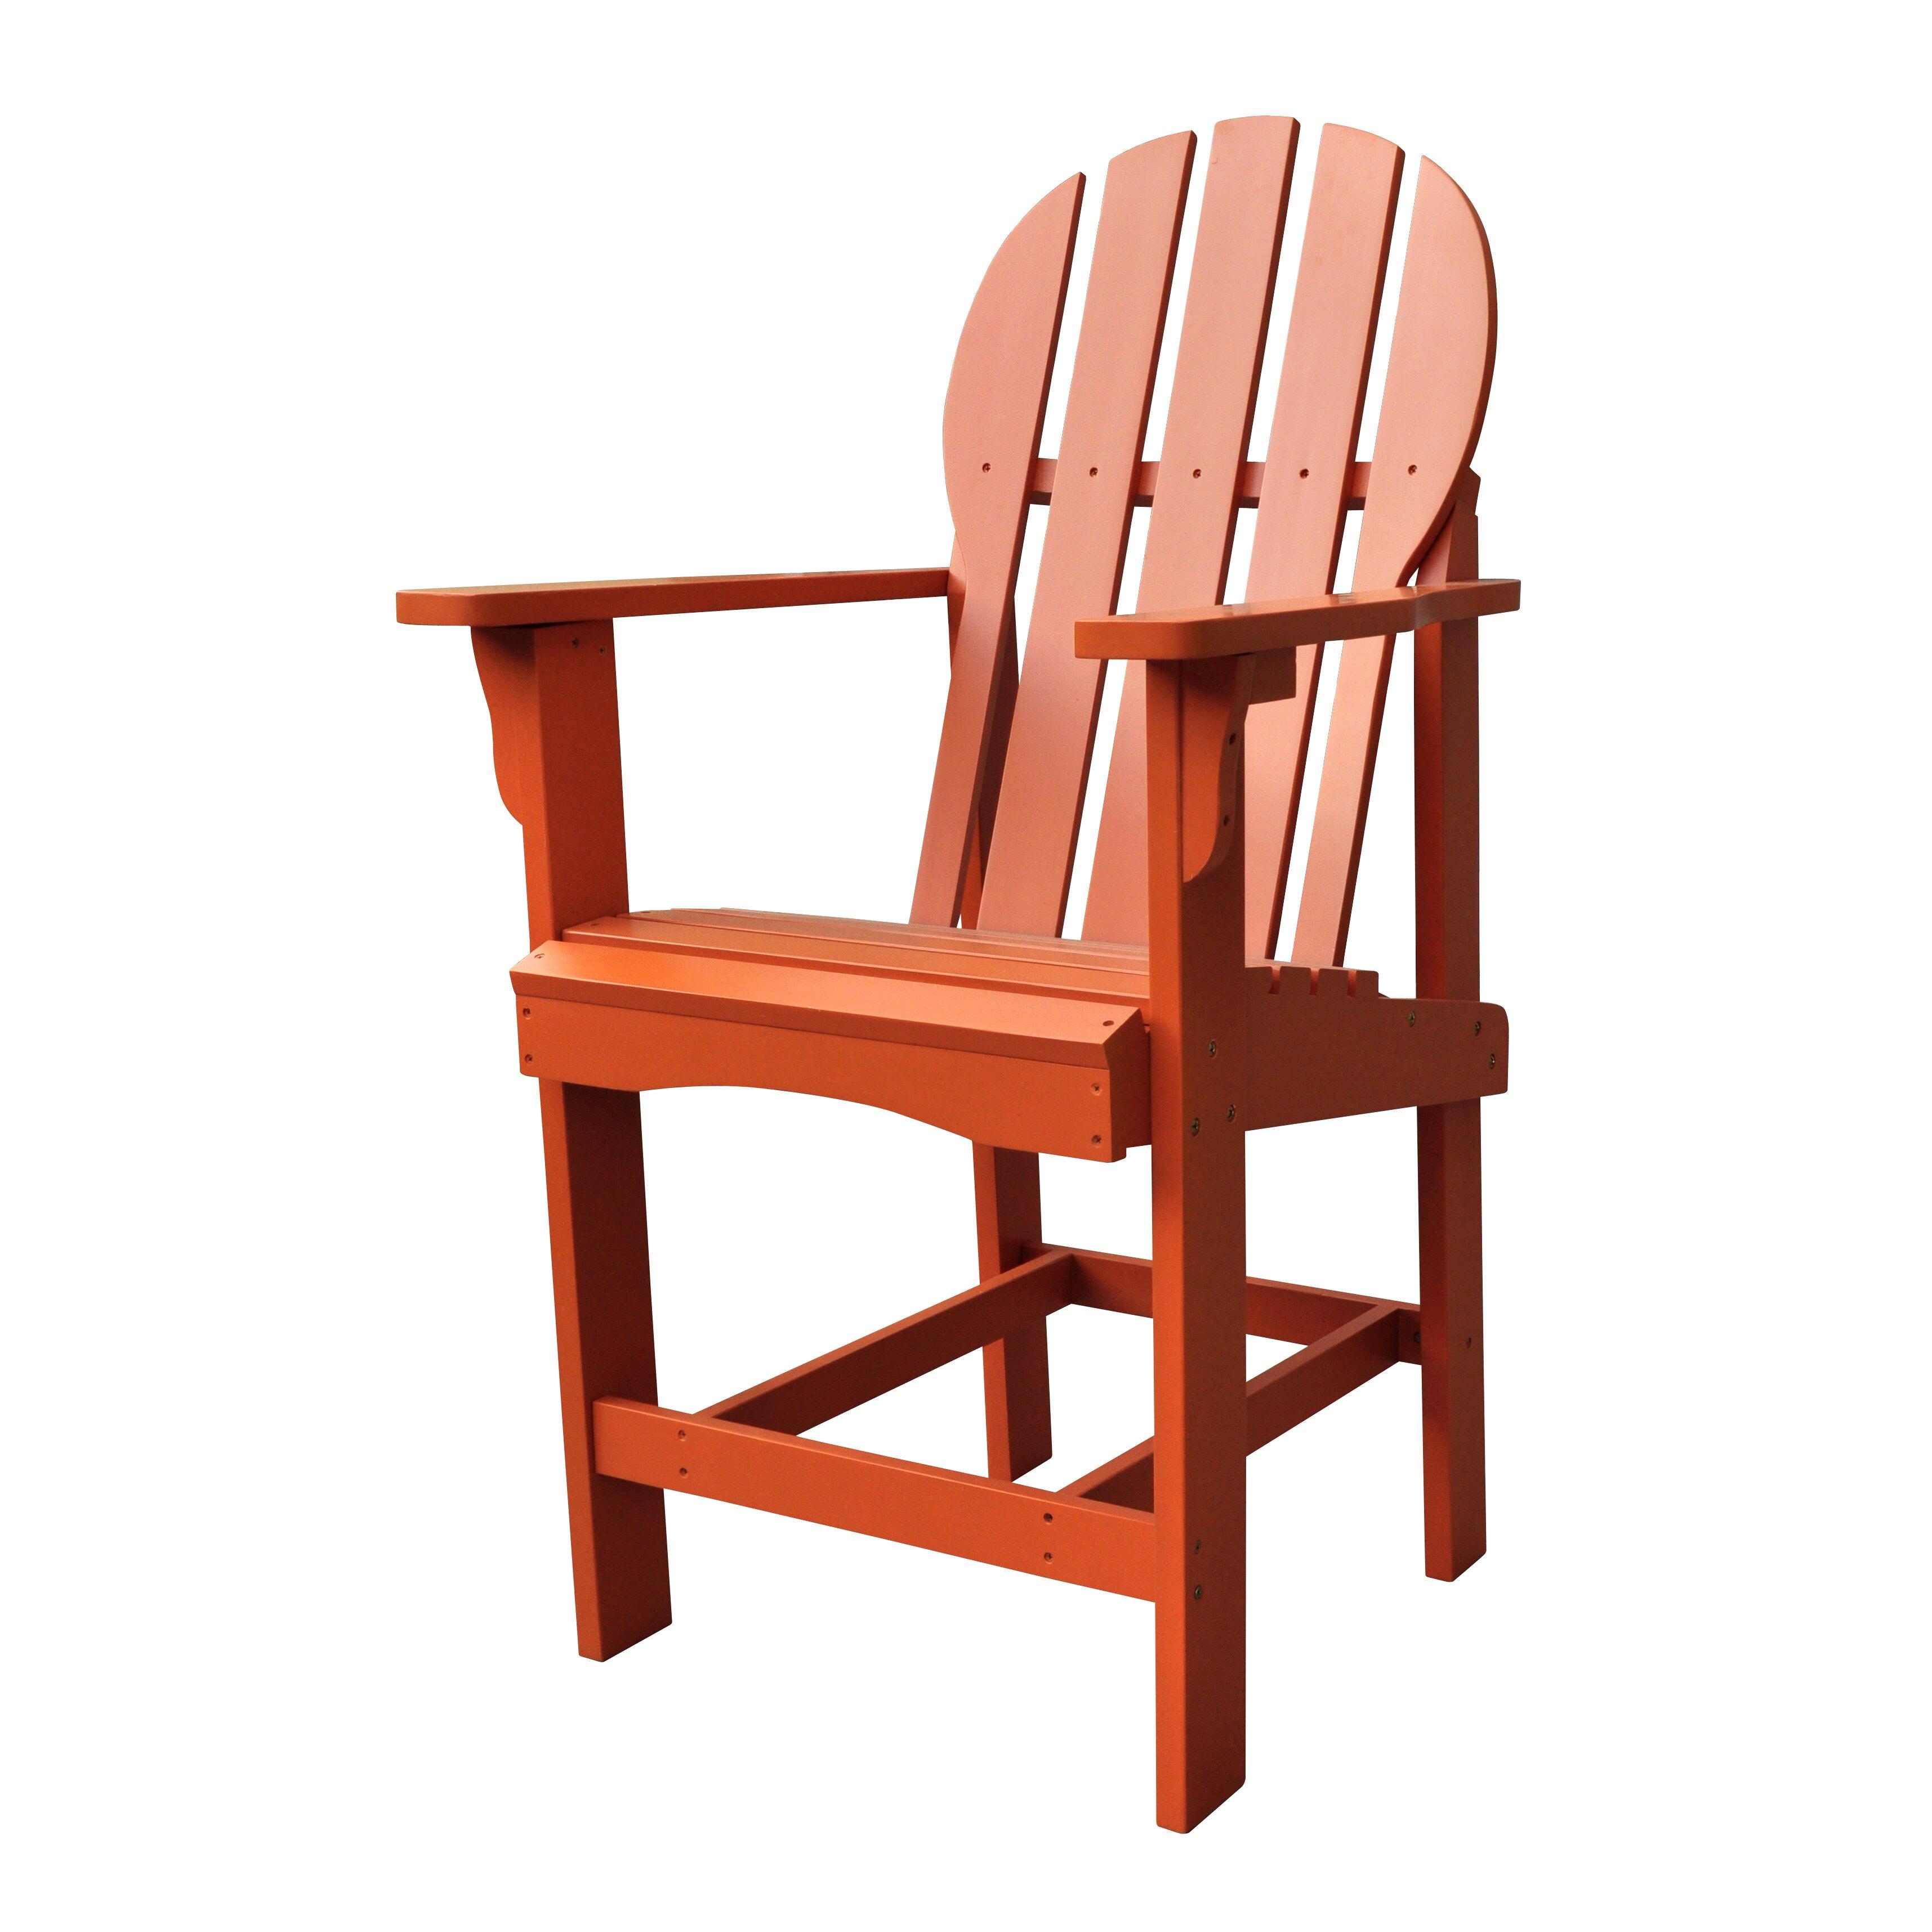 Shine pany Inc Captiva Counter Height Adirondack Chair